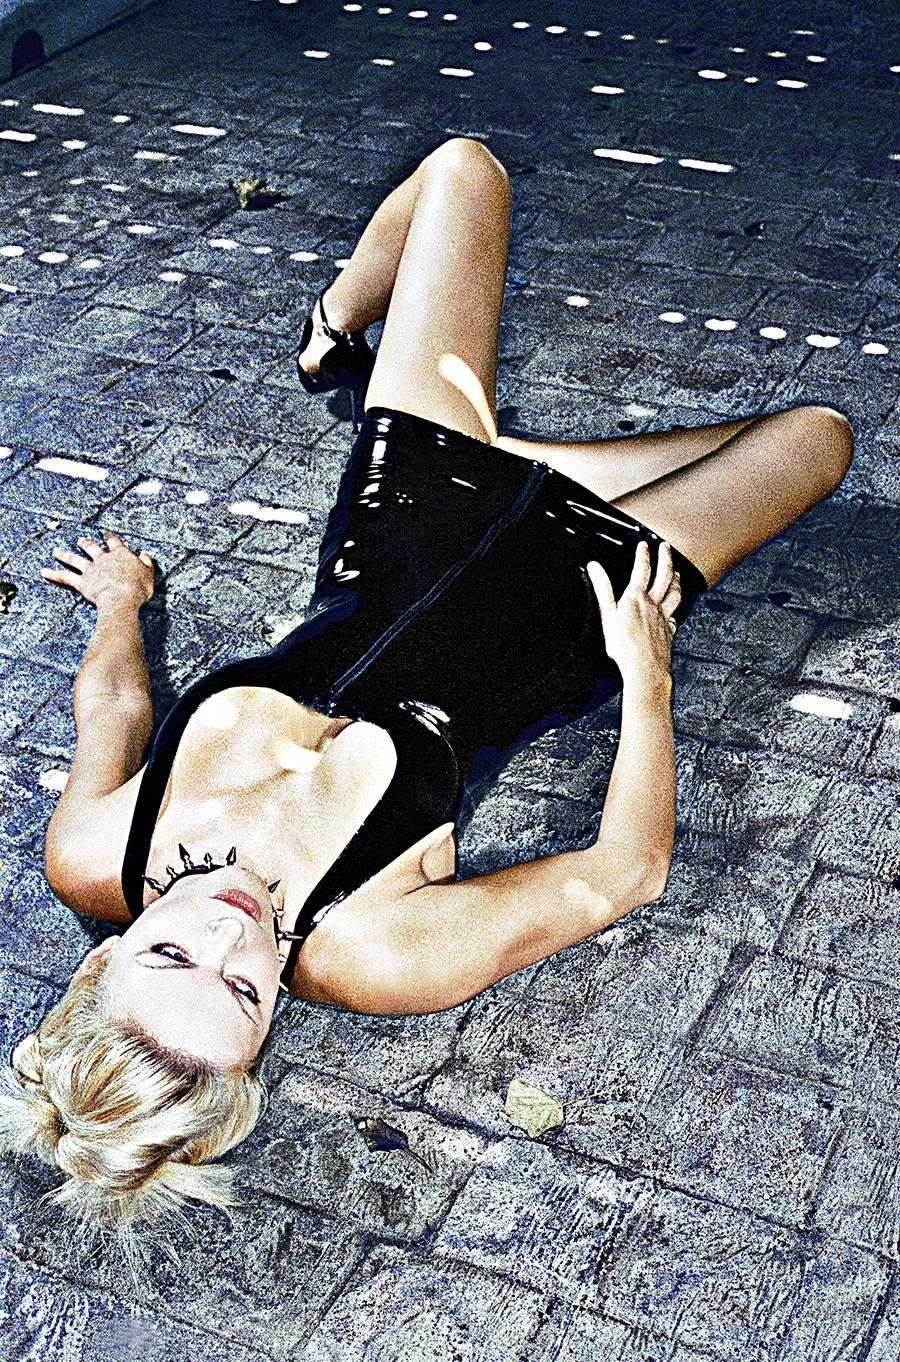 Tony_Ward_erotic_fetish_photography_latex_dress_stone_pavement_collar_blond_model_fashion_shoot_Jersey_shore